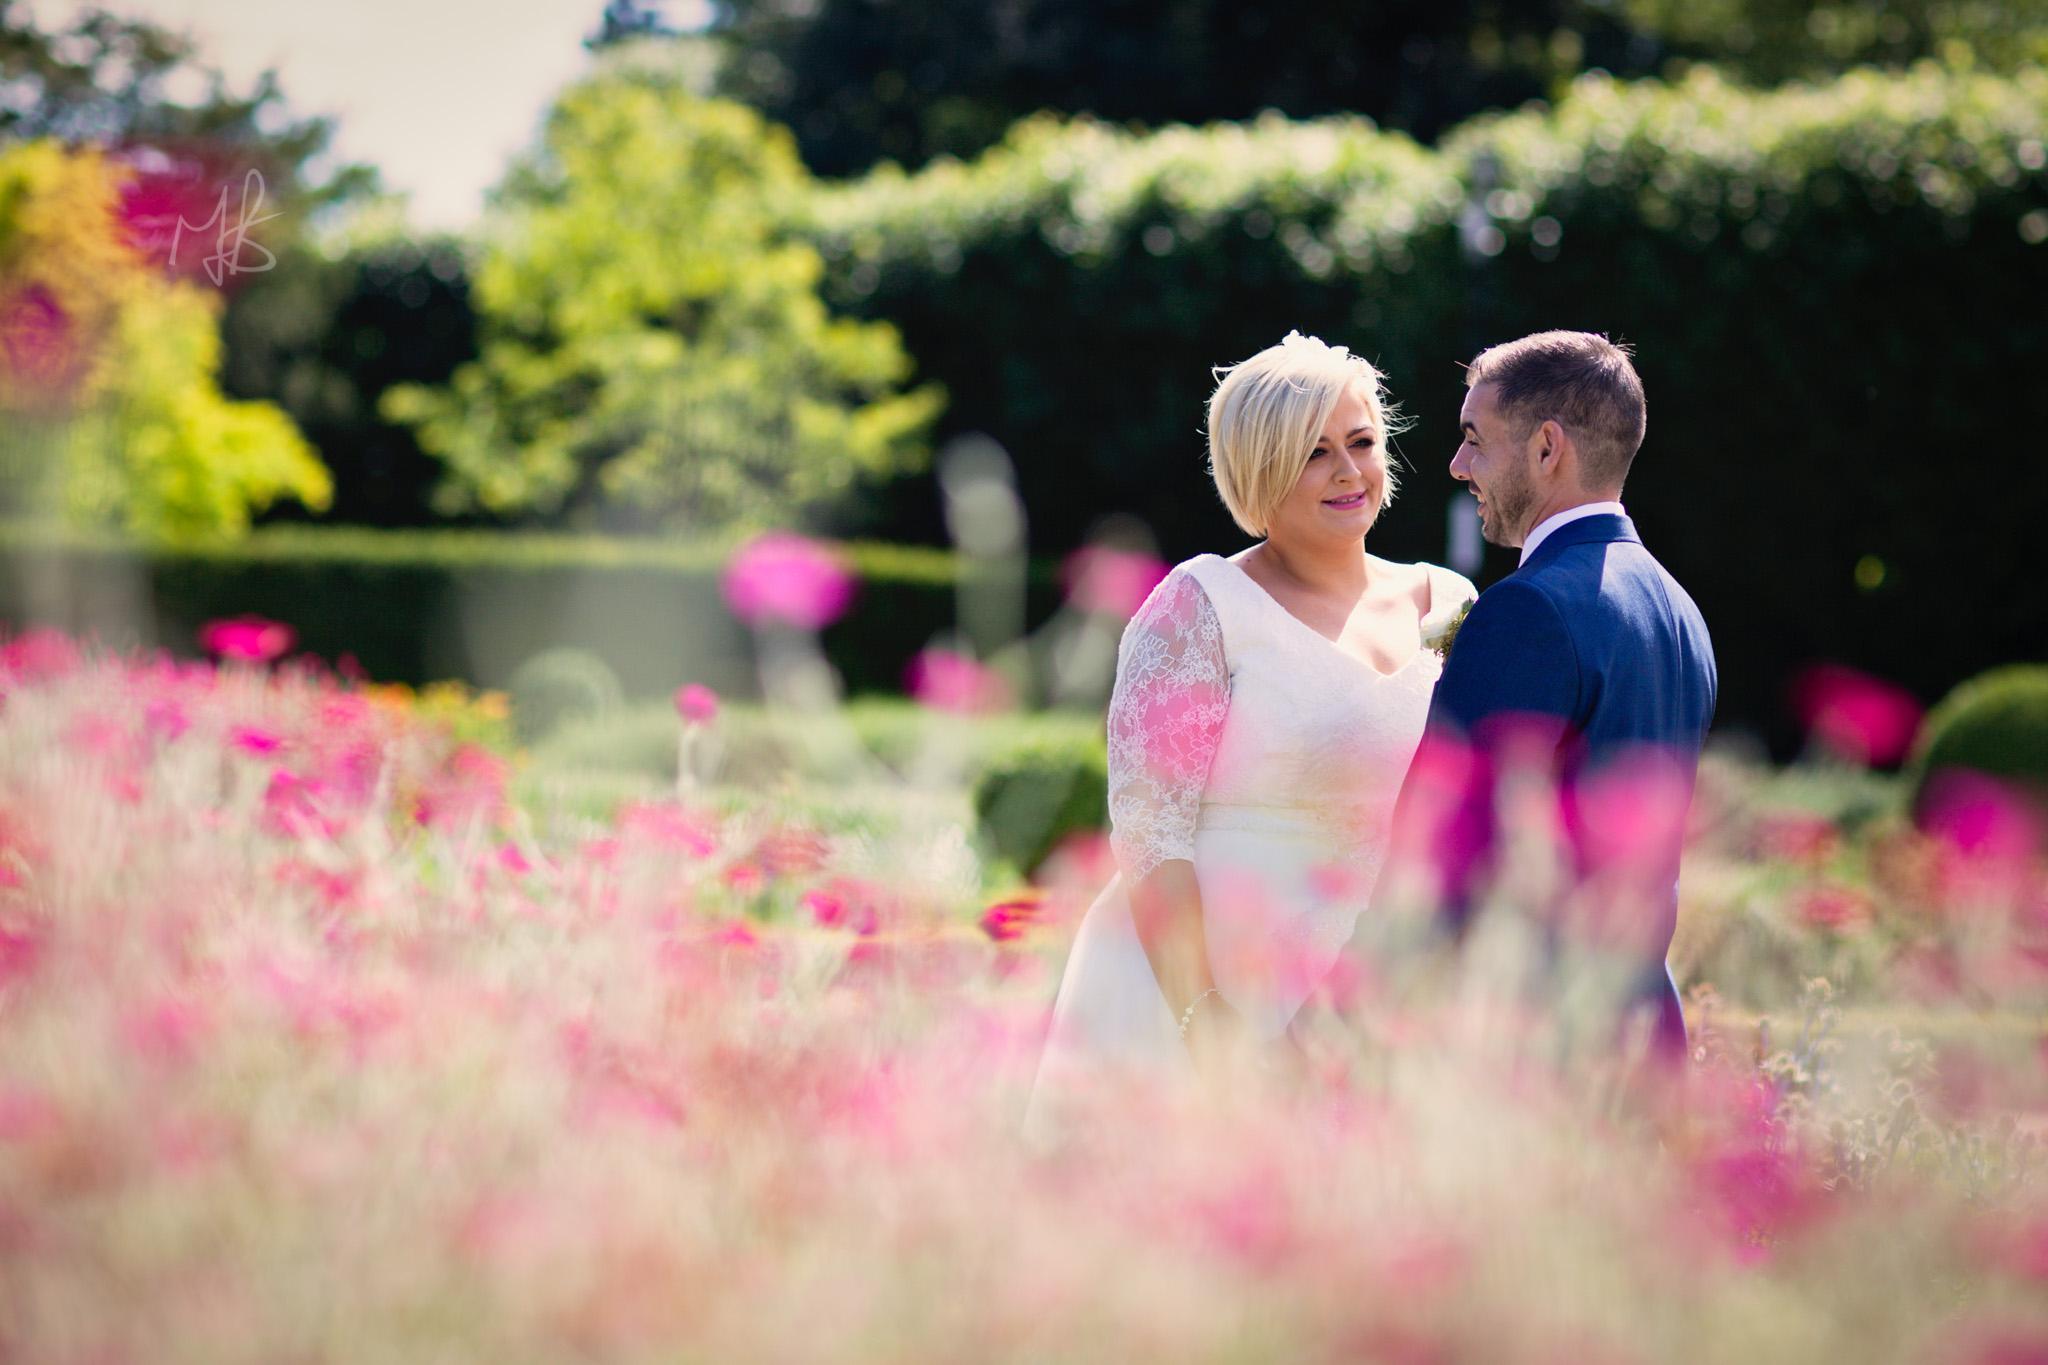 Northern-Ireland-Wedding-Photographer-Mark-Barnes-Ballymena_wedding-photography-Leighinmohr-House-Seamas_Alanna_For-web-31.jpg